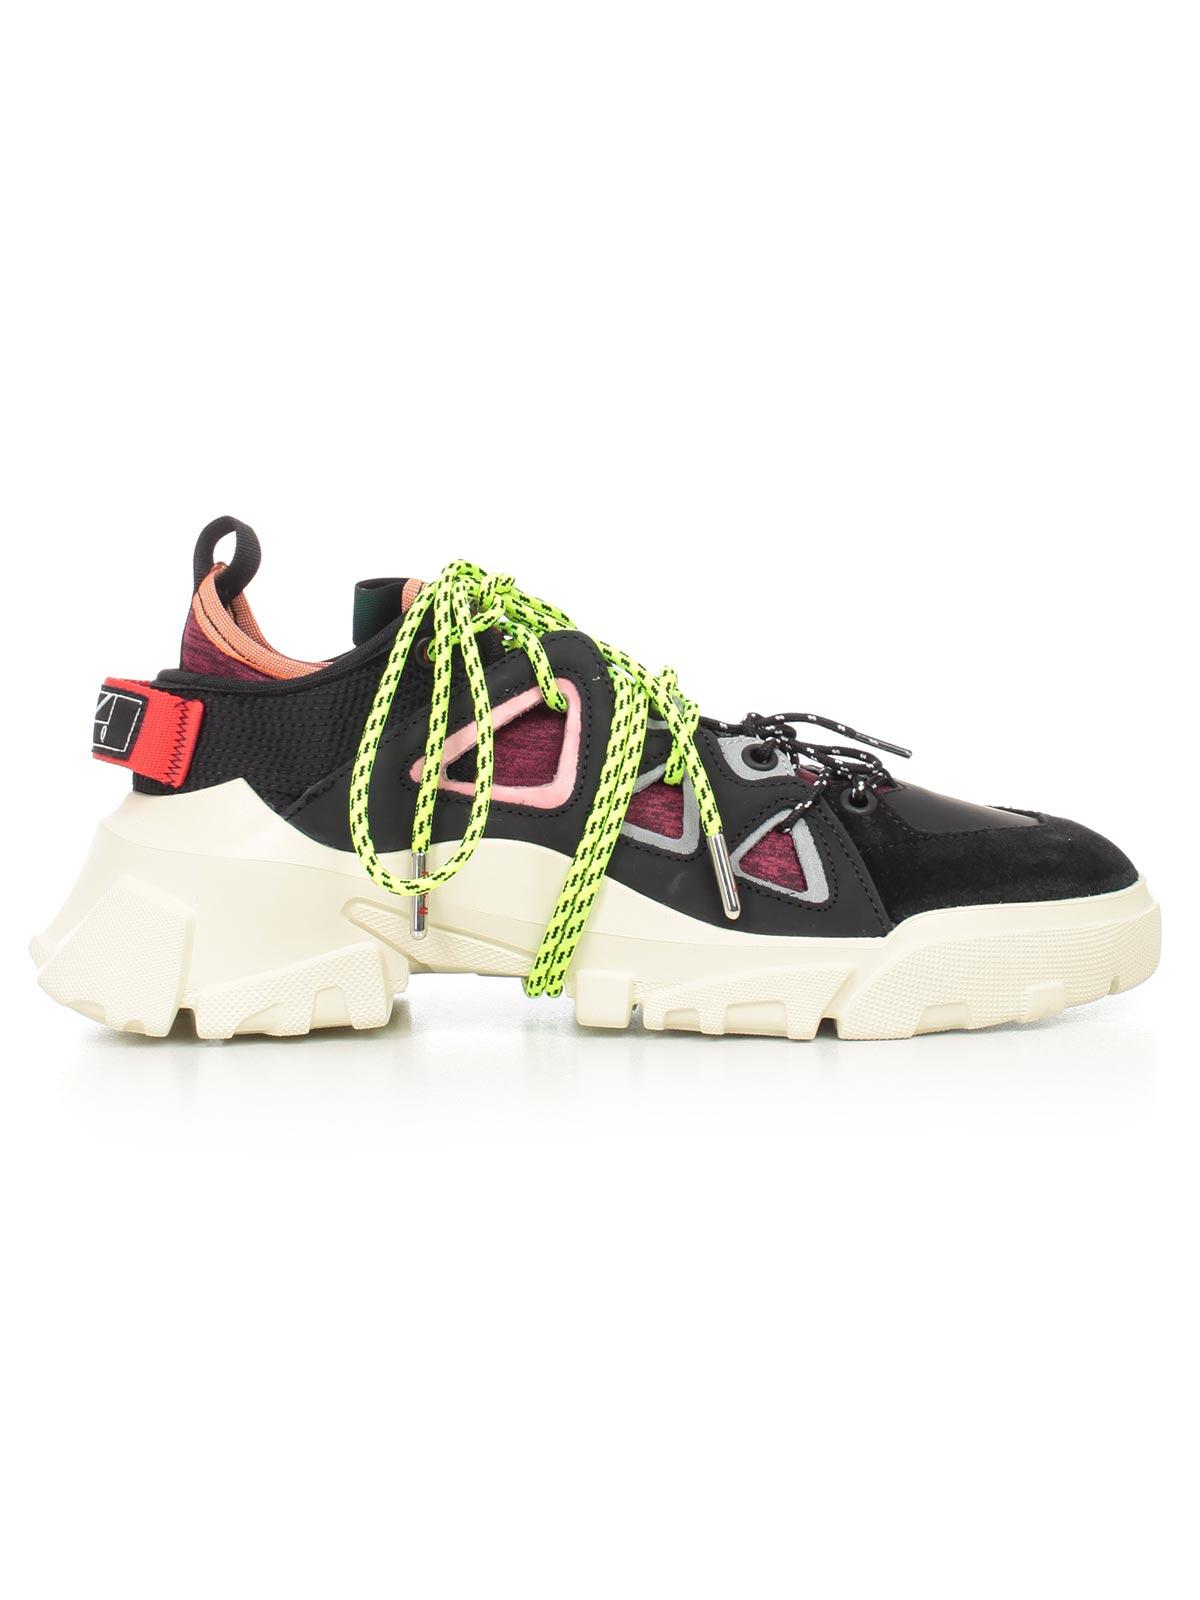 Mcq Alexander Mcqueen Shoes 573012